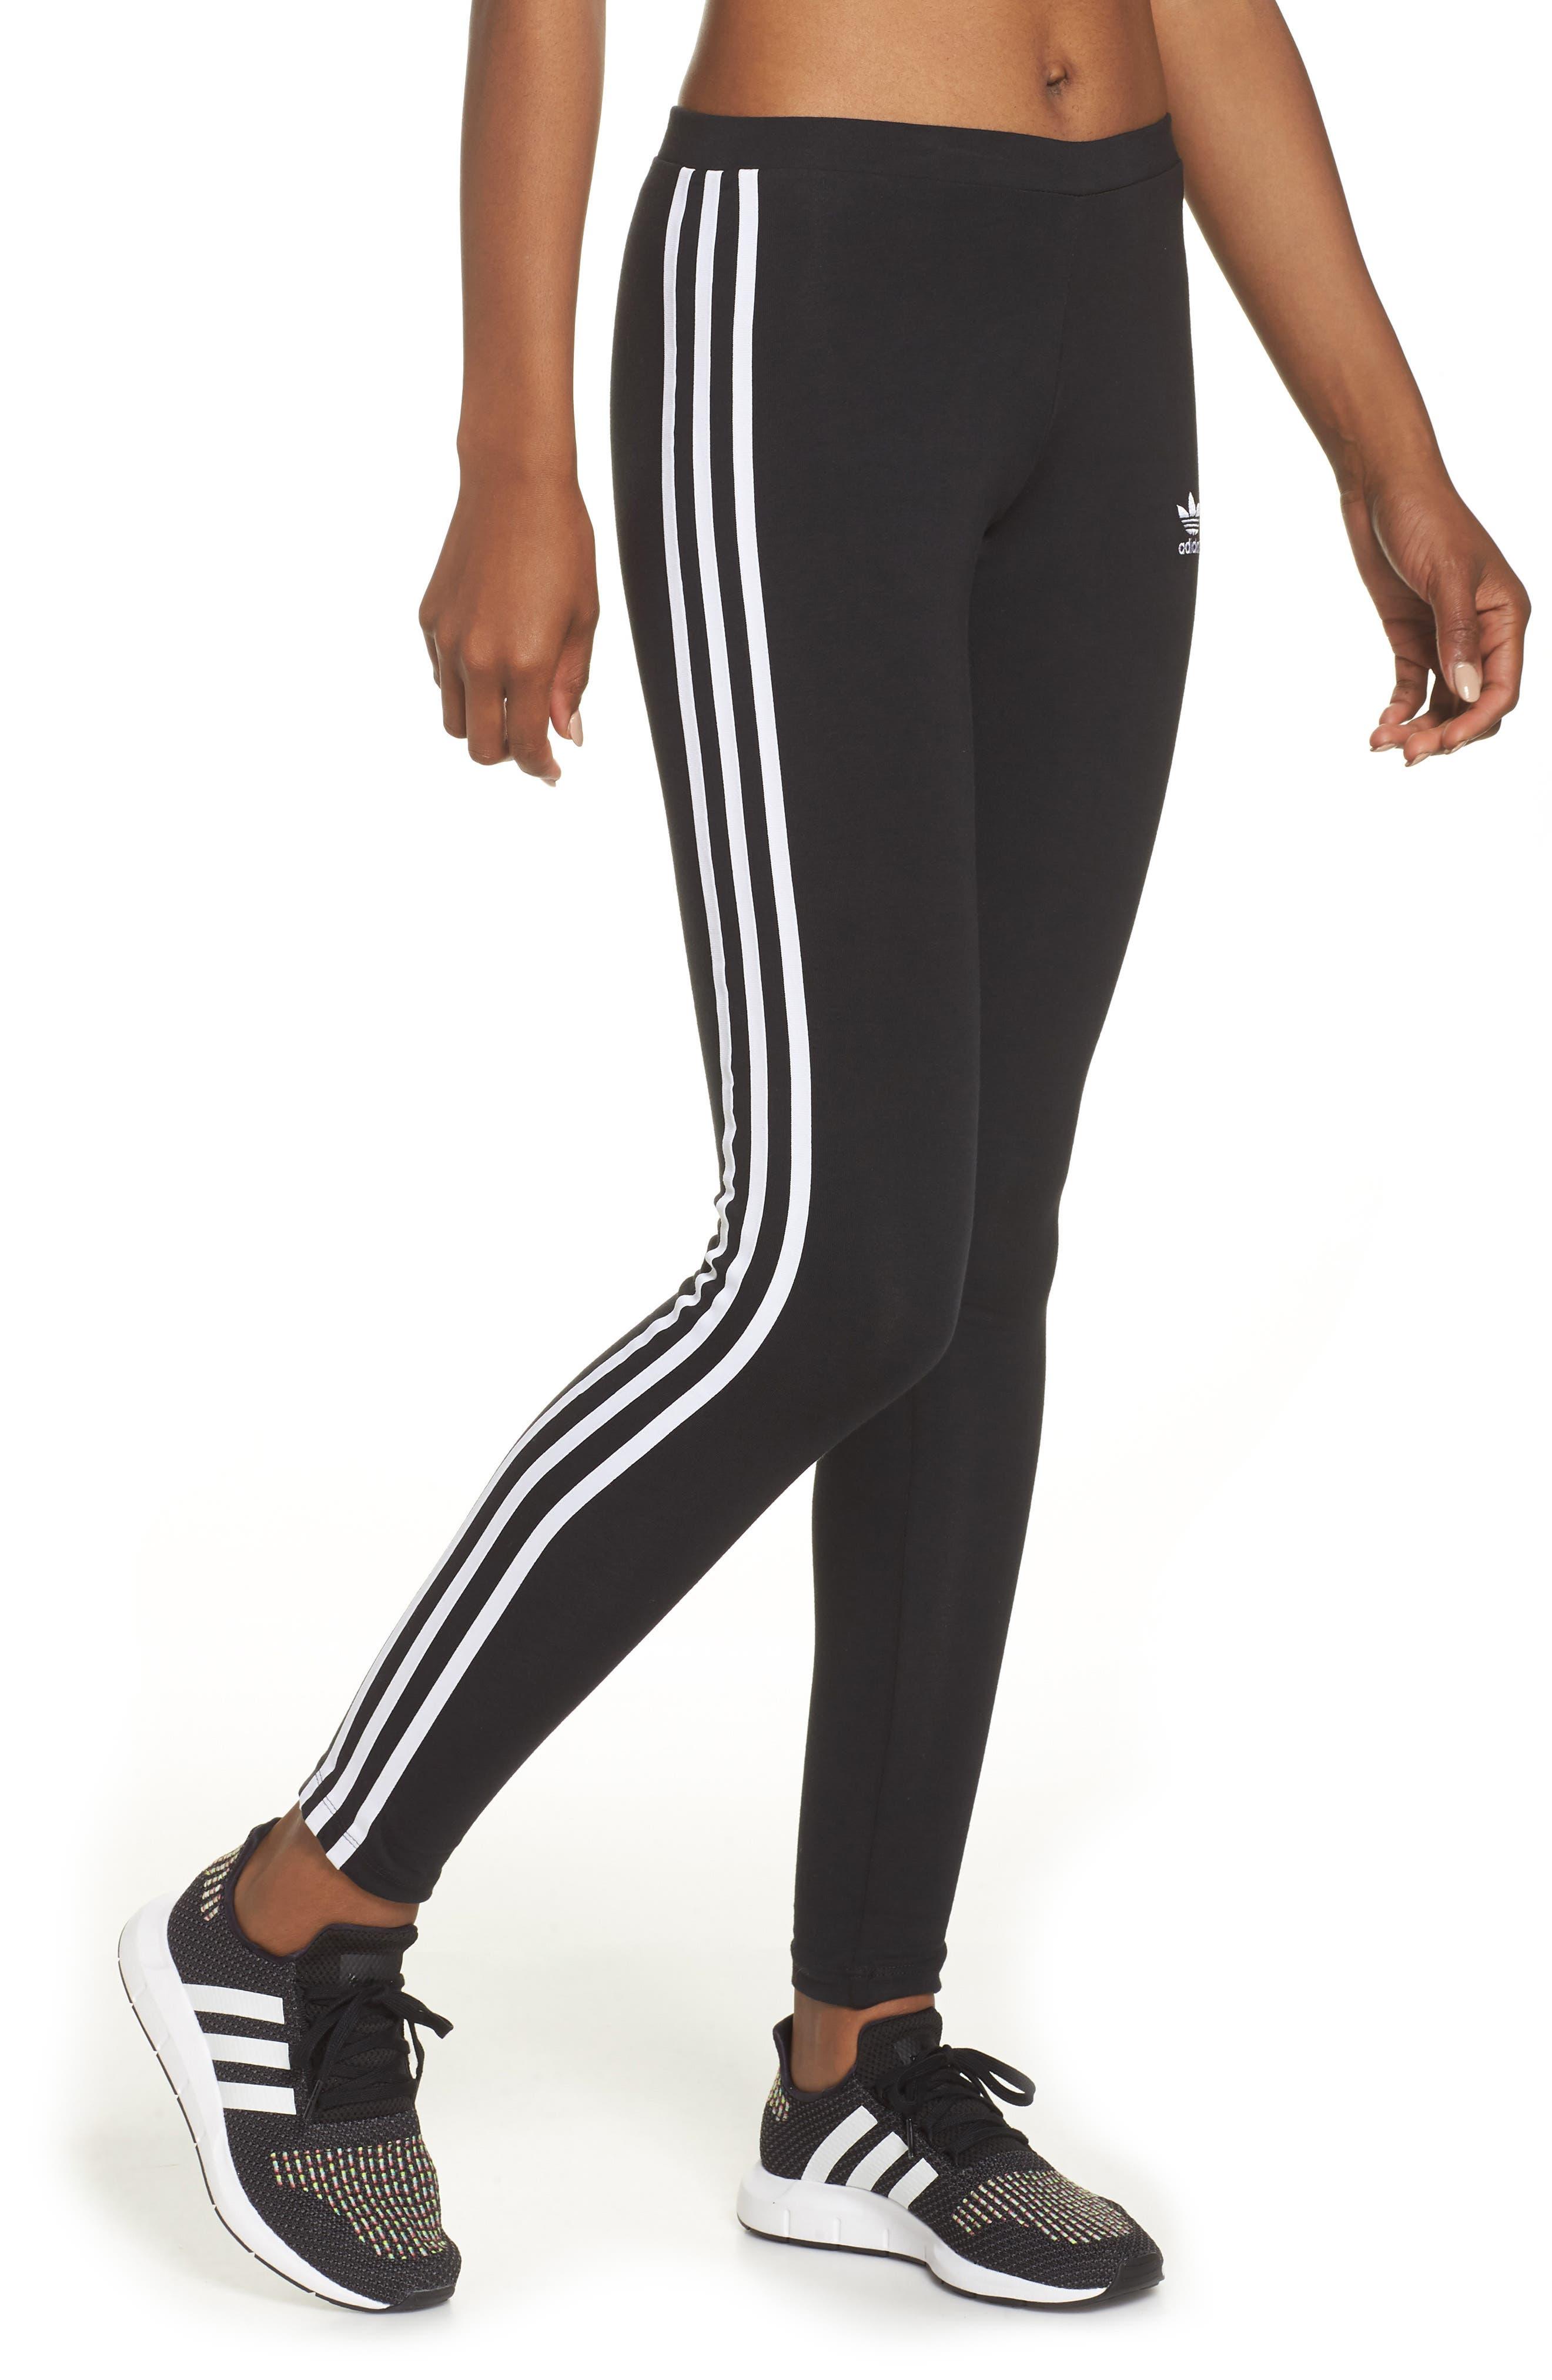 ADIDAS ORIGINALS adidas 3-Stripes Tights, Main, color, 001